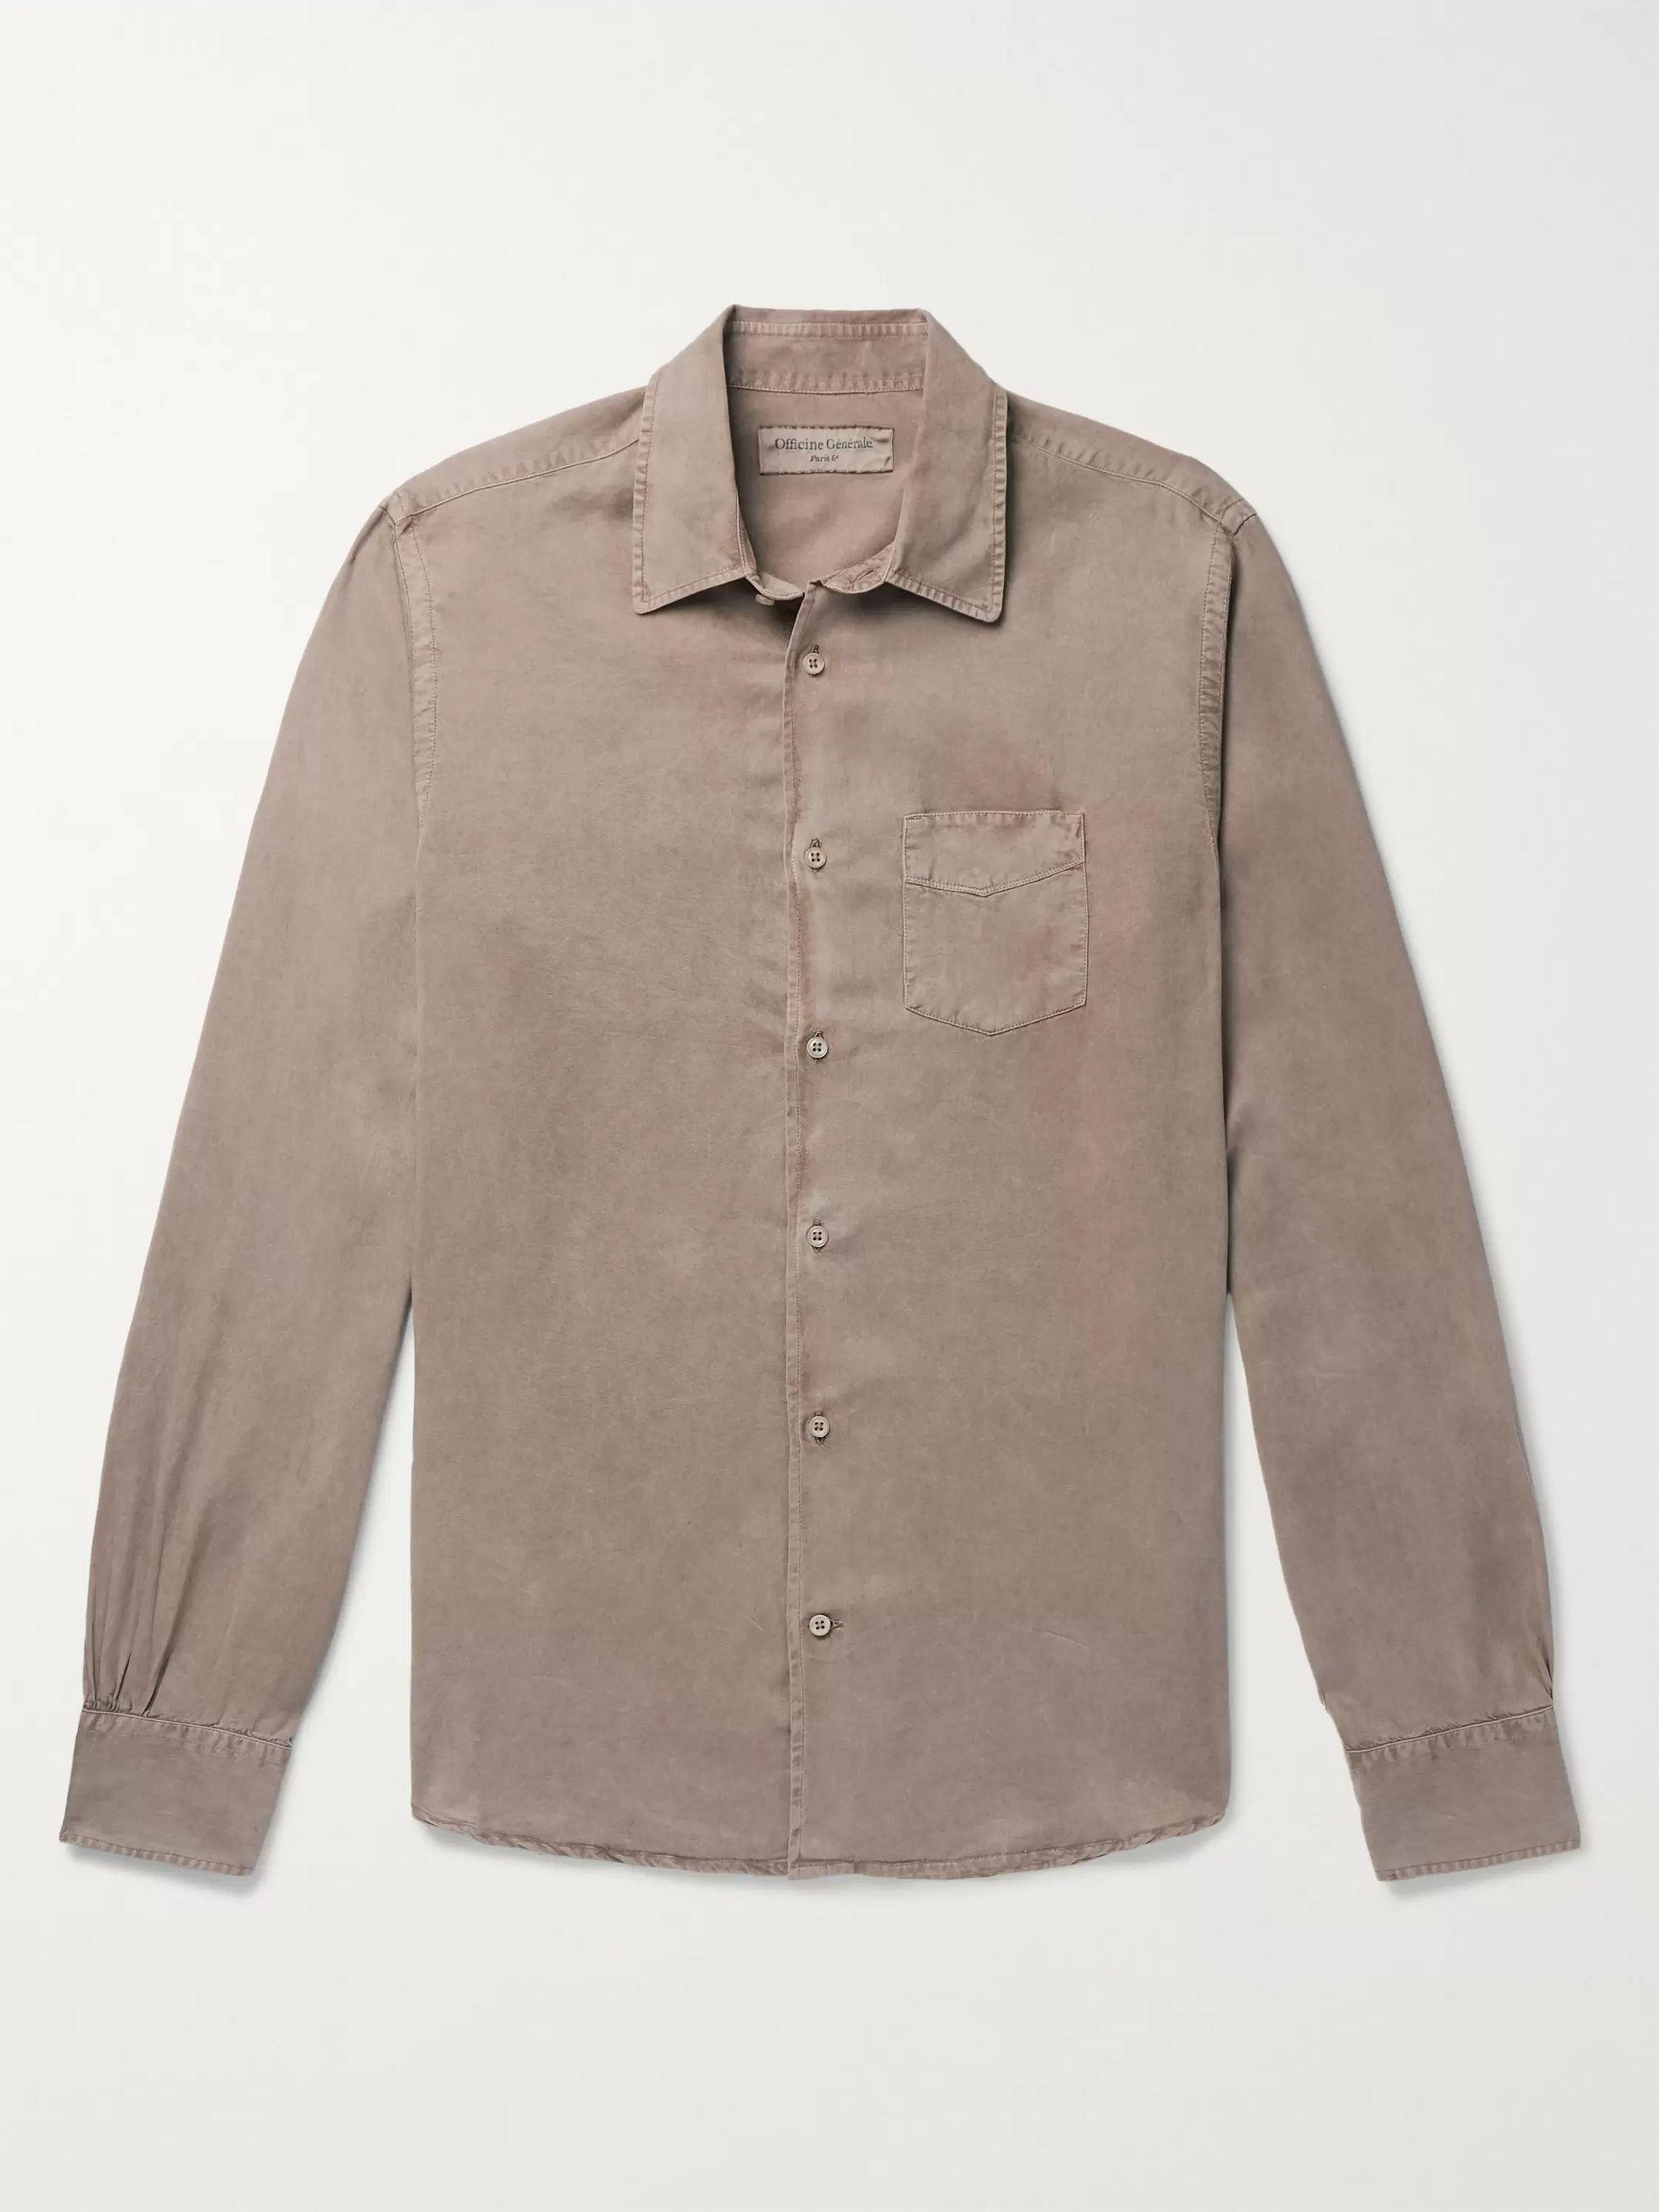 Benoit Pigment Dyed Lyocell Shirt by Mr Porter